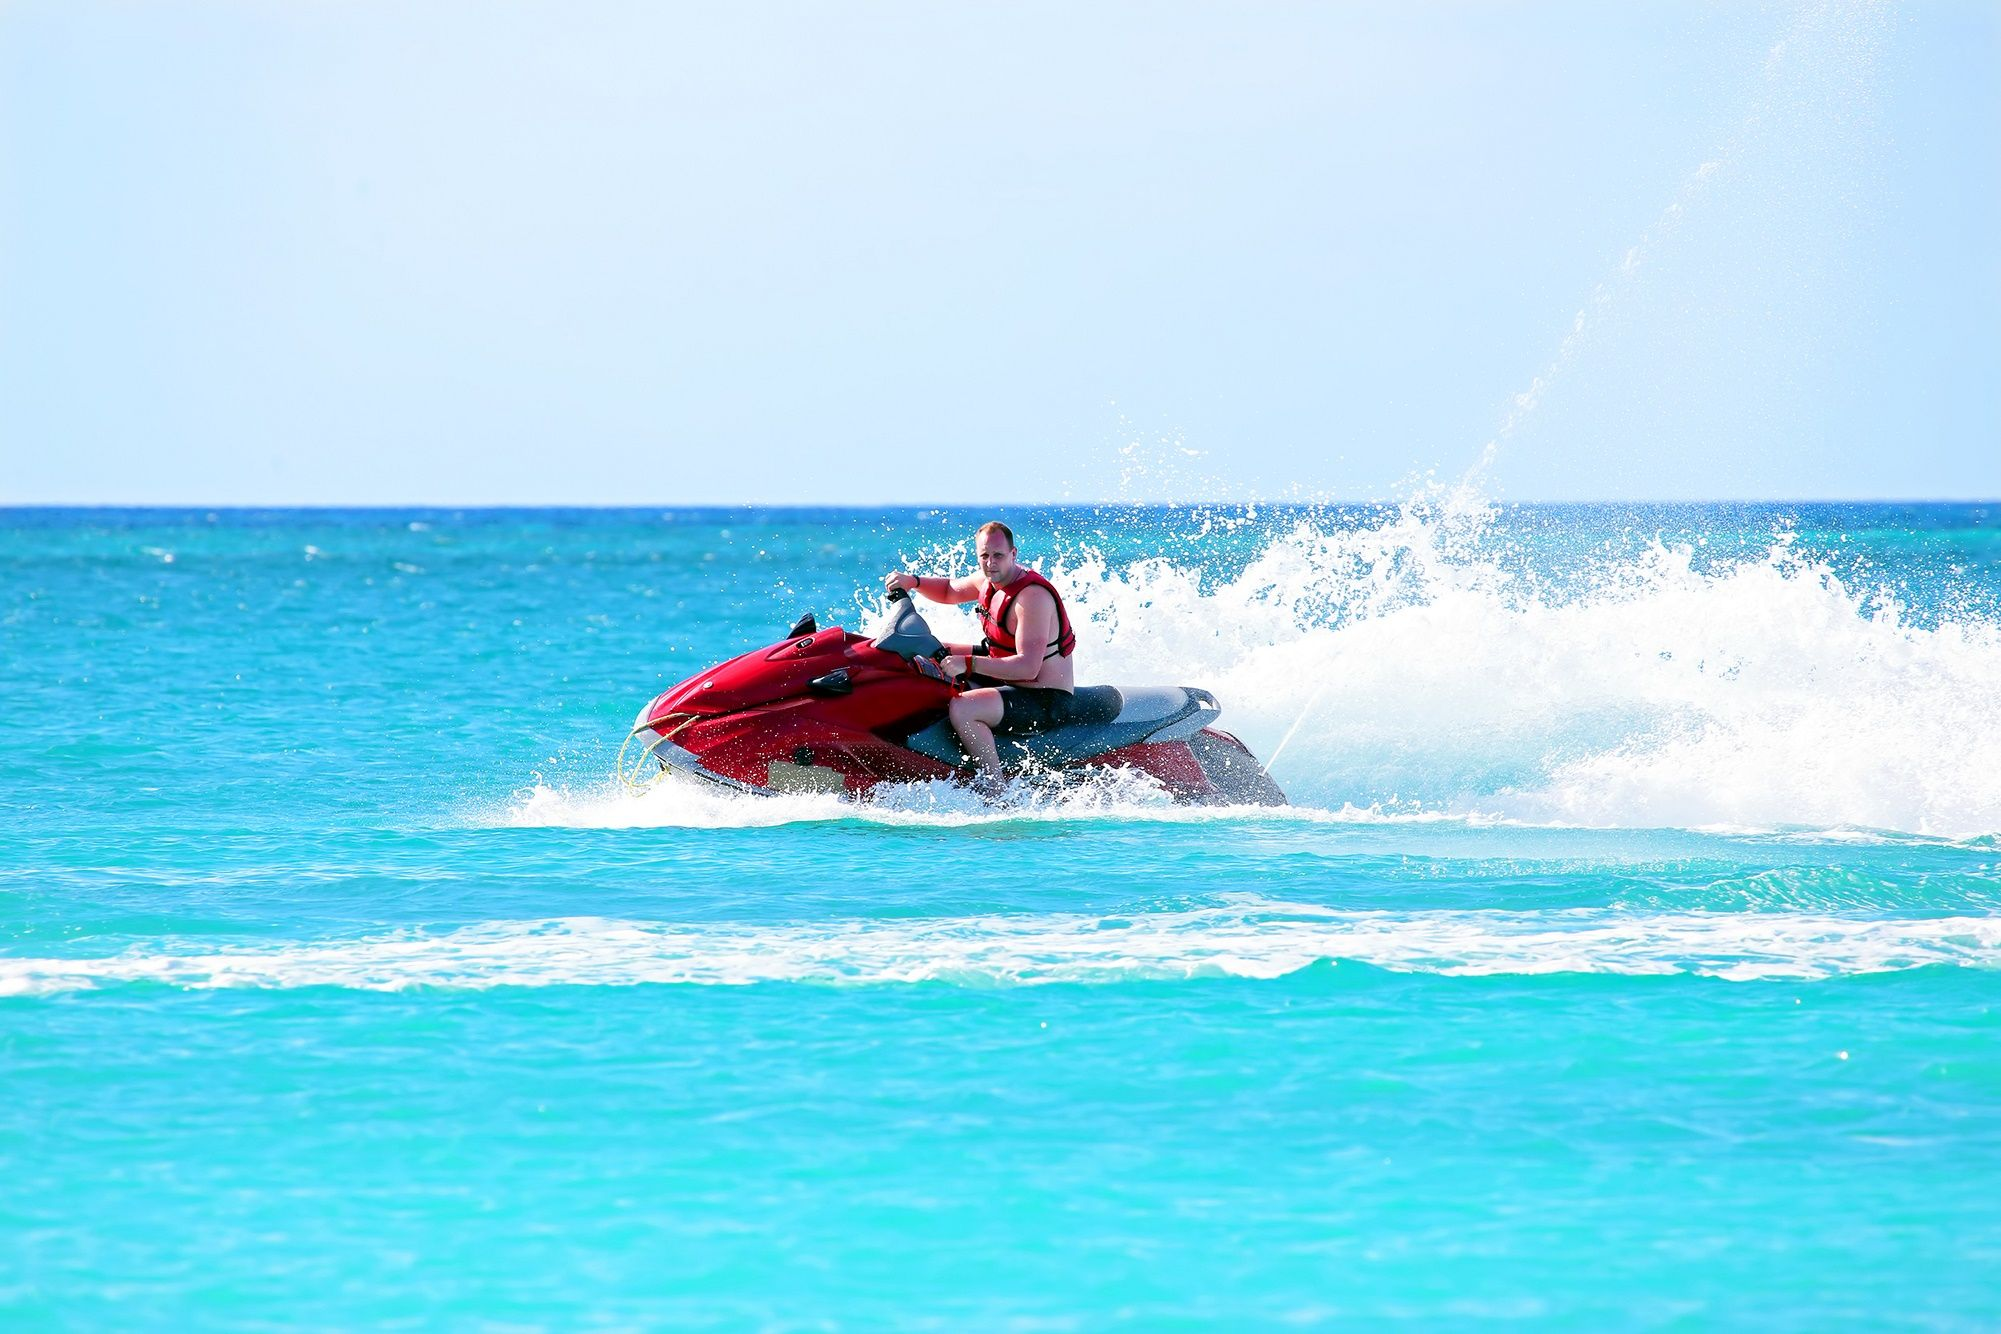 Http Www Jetskidubai Com Services Jet Ski Rental Dubai Ski Brands Jet Ski Rentals Personal Watercraft